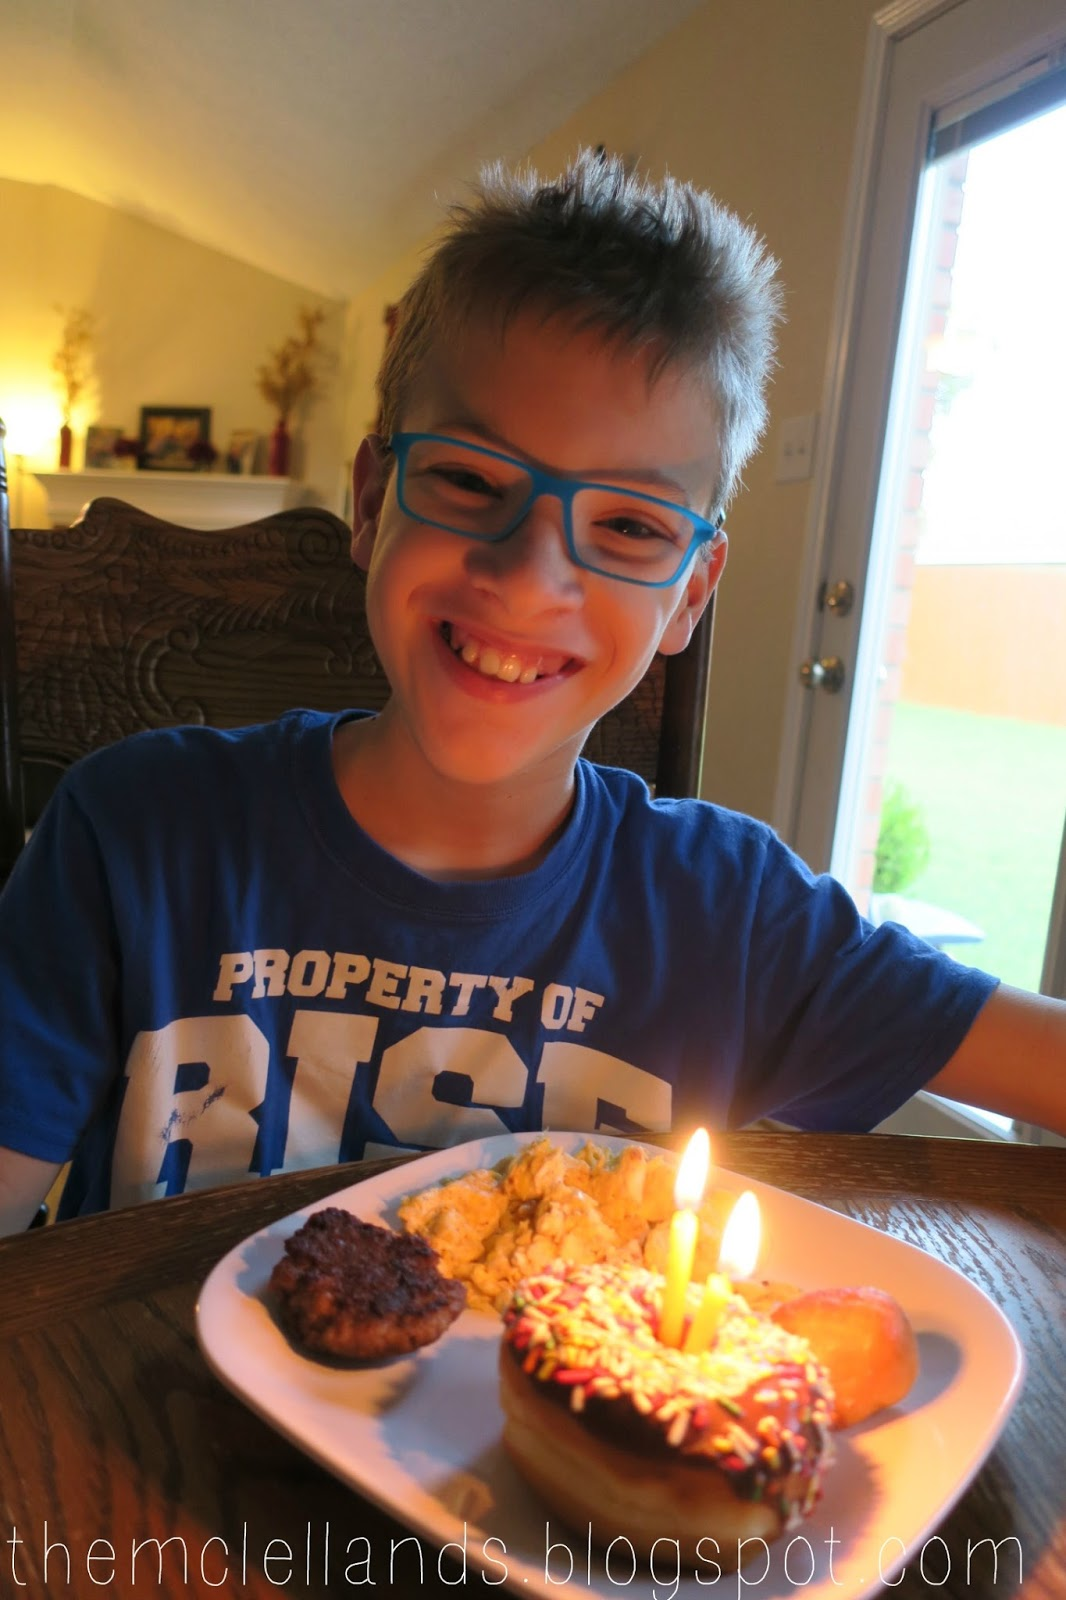 Beyond Measure: Celebrating 11 years old